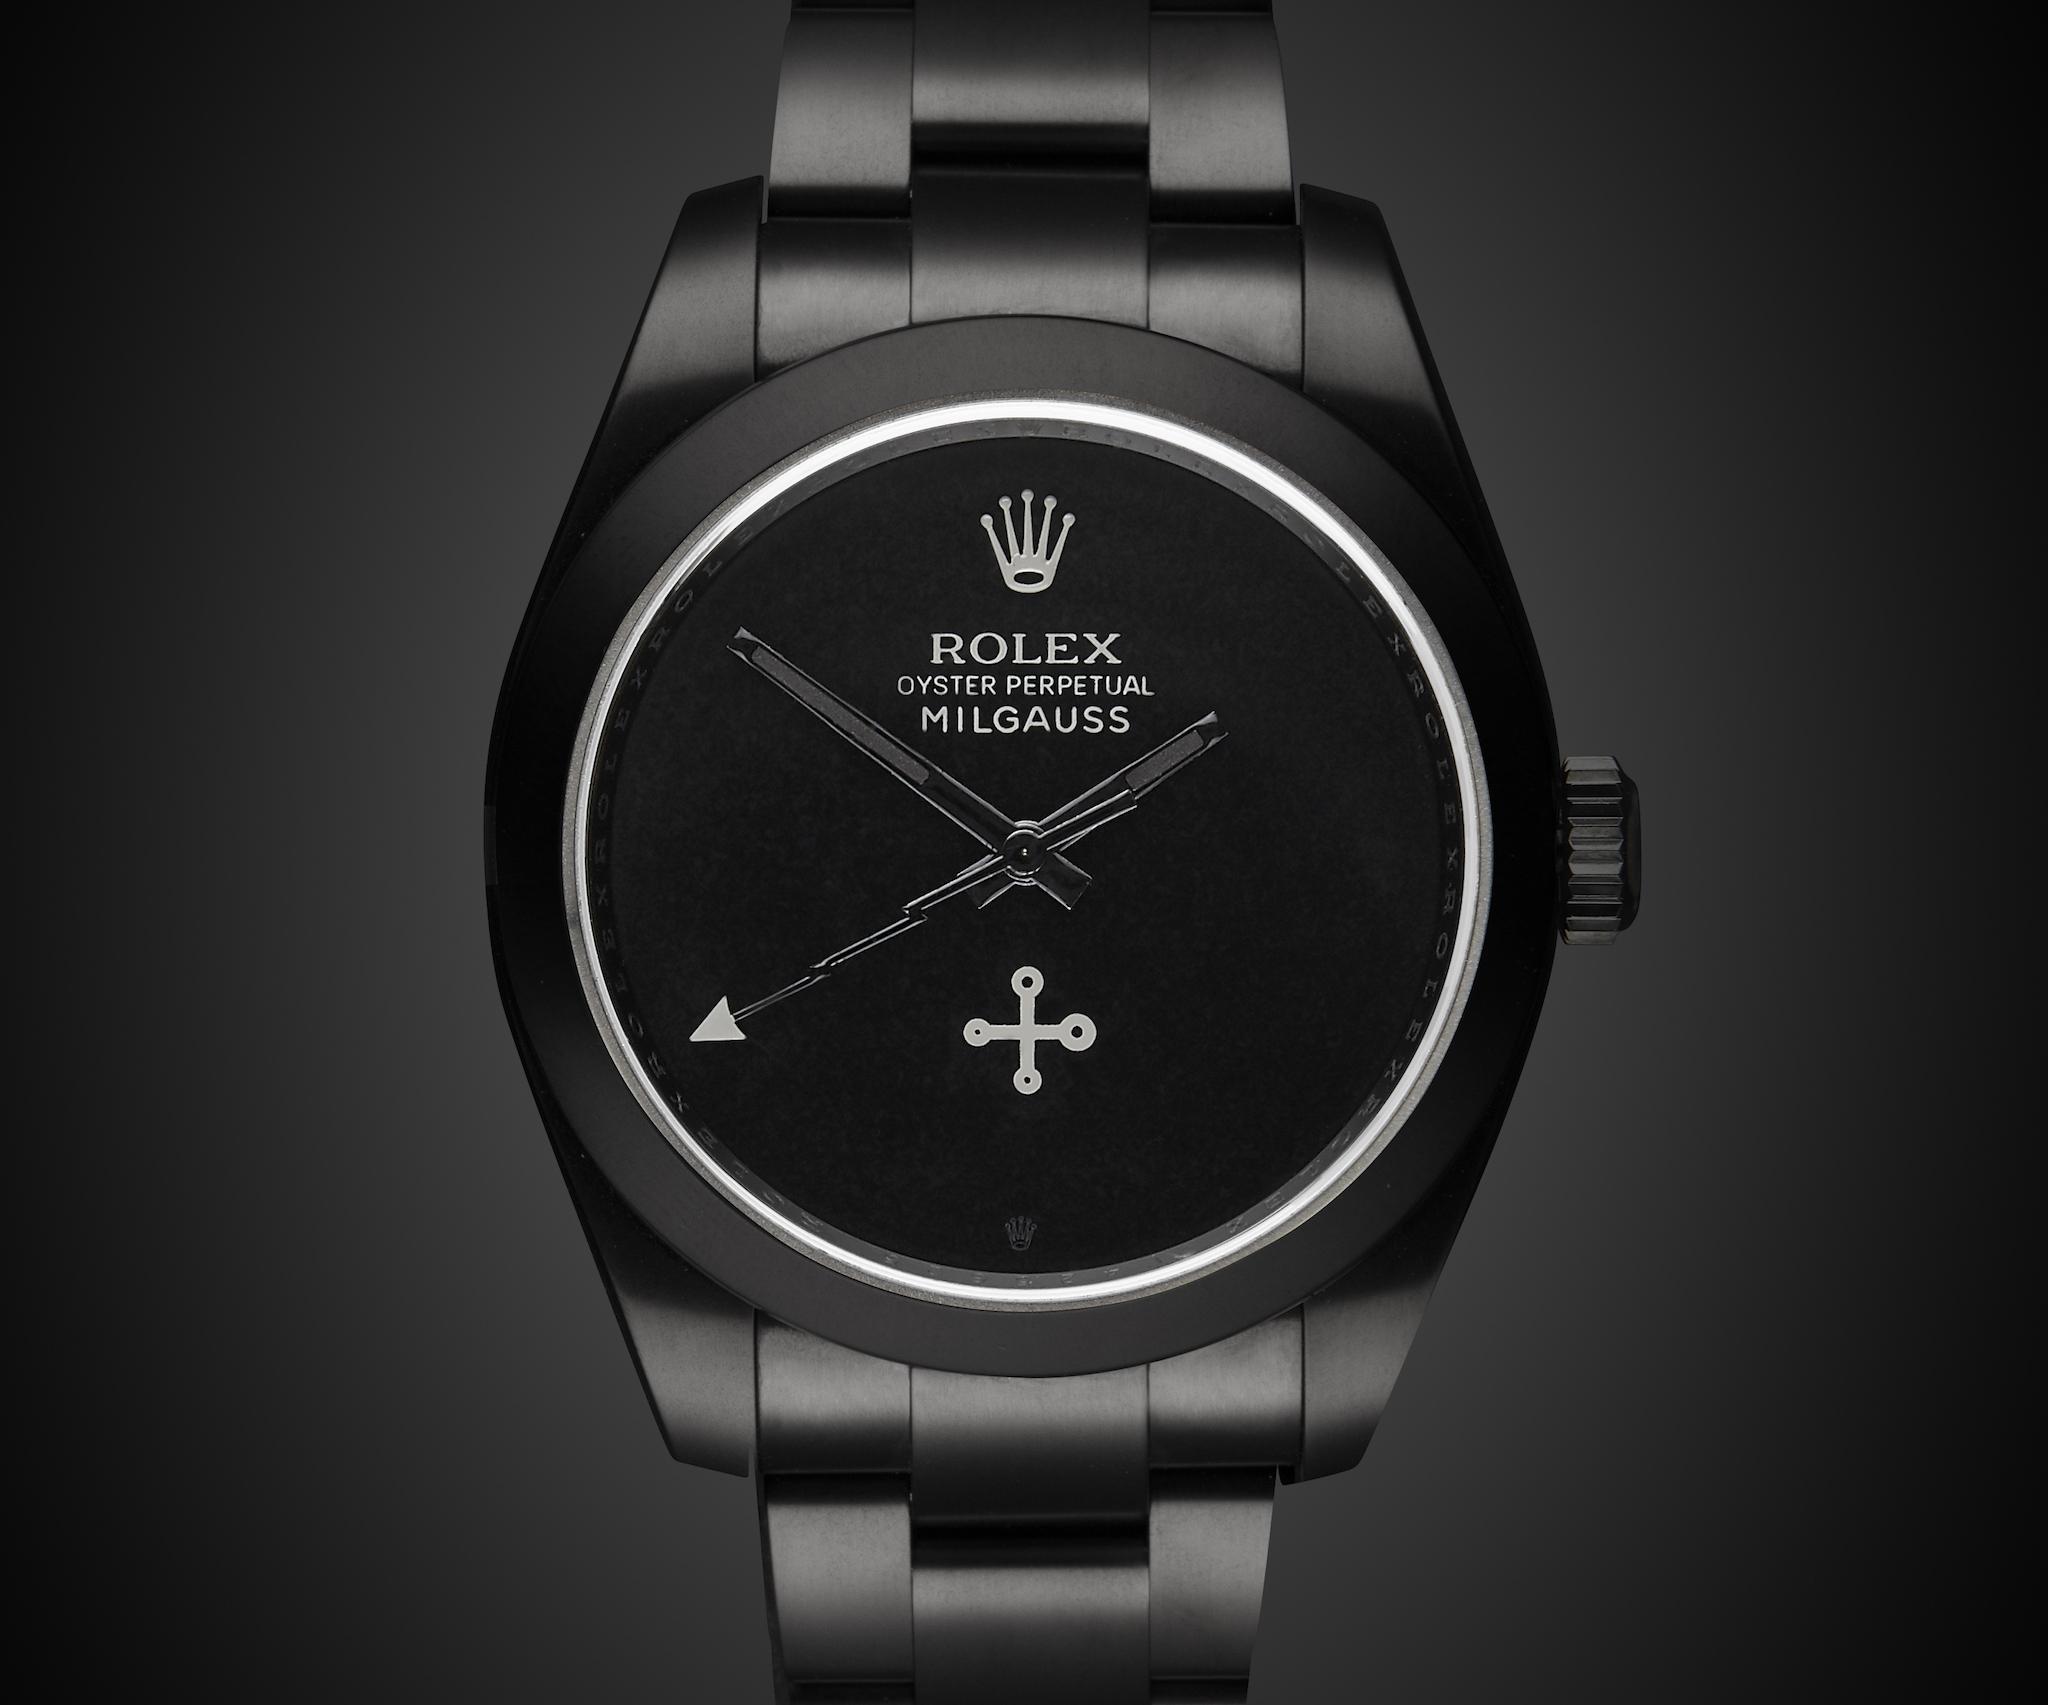 Rolex Oyster Perpetual Milgauss Black